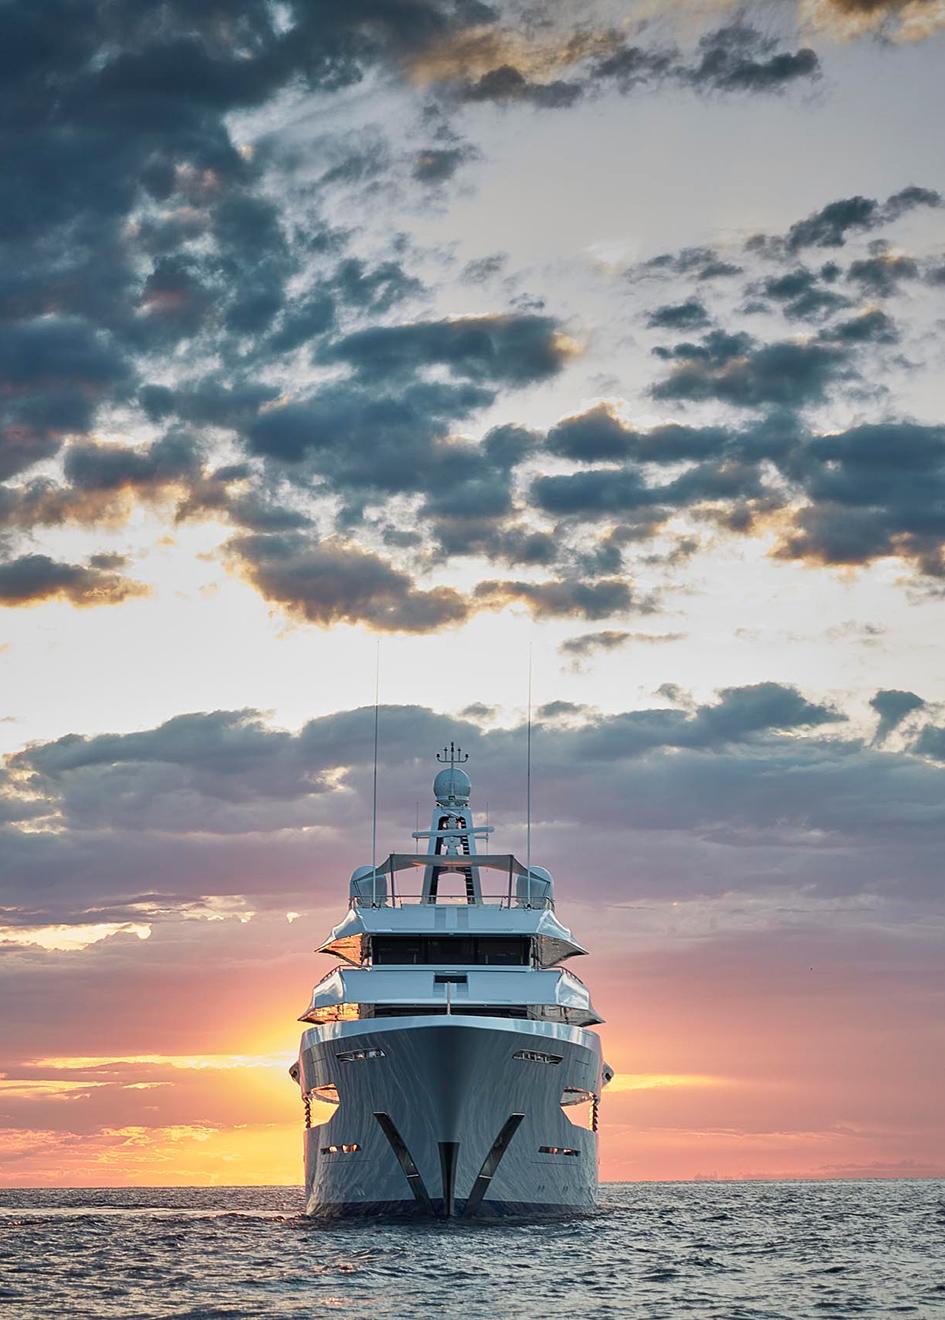 sunrise-shot-of-feadship-super-yacht-joy